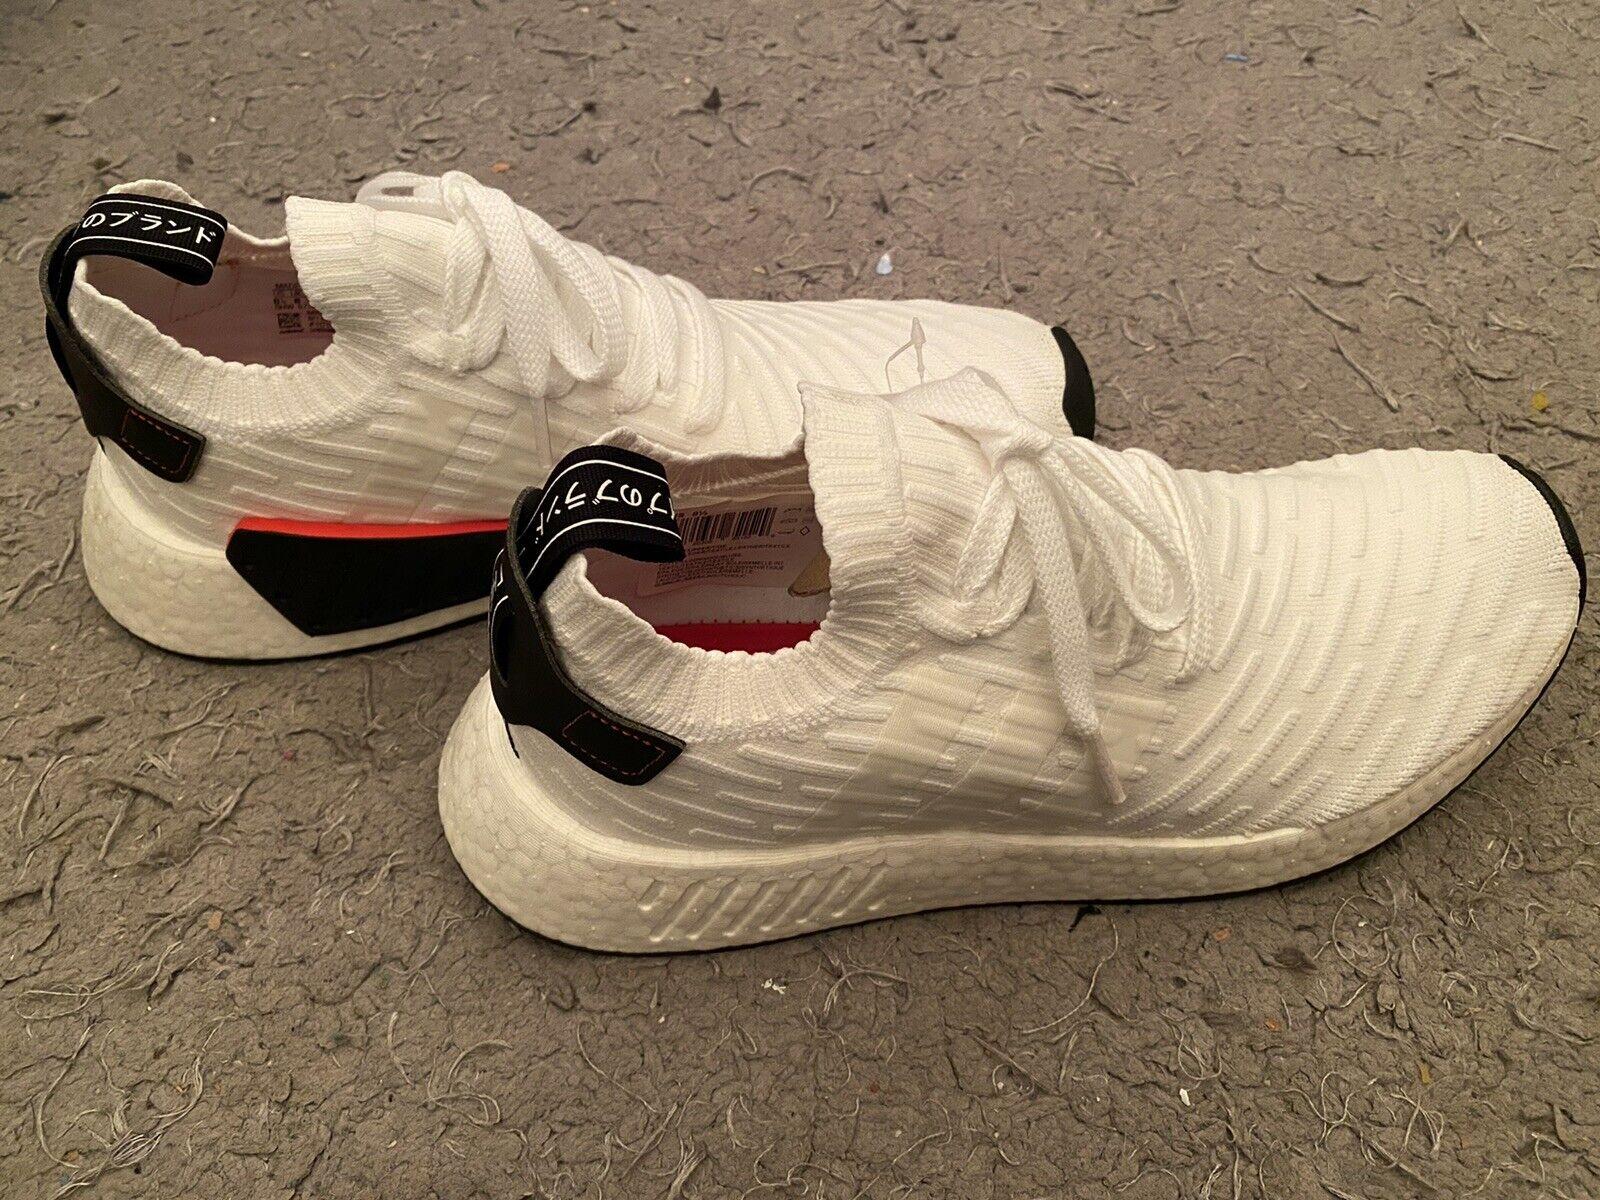 Size 8.5 - adidas NMD R2 Primeknit White Black 2017